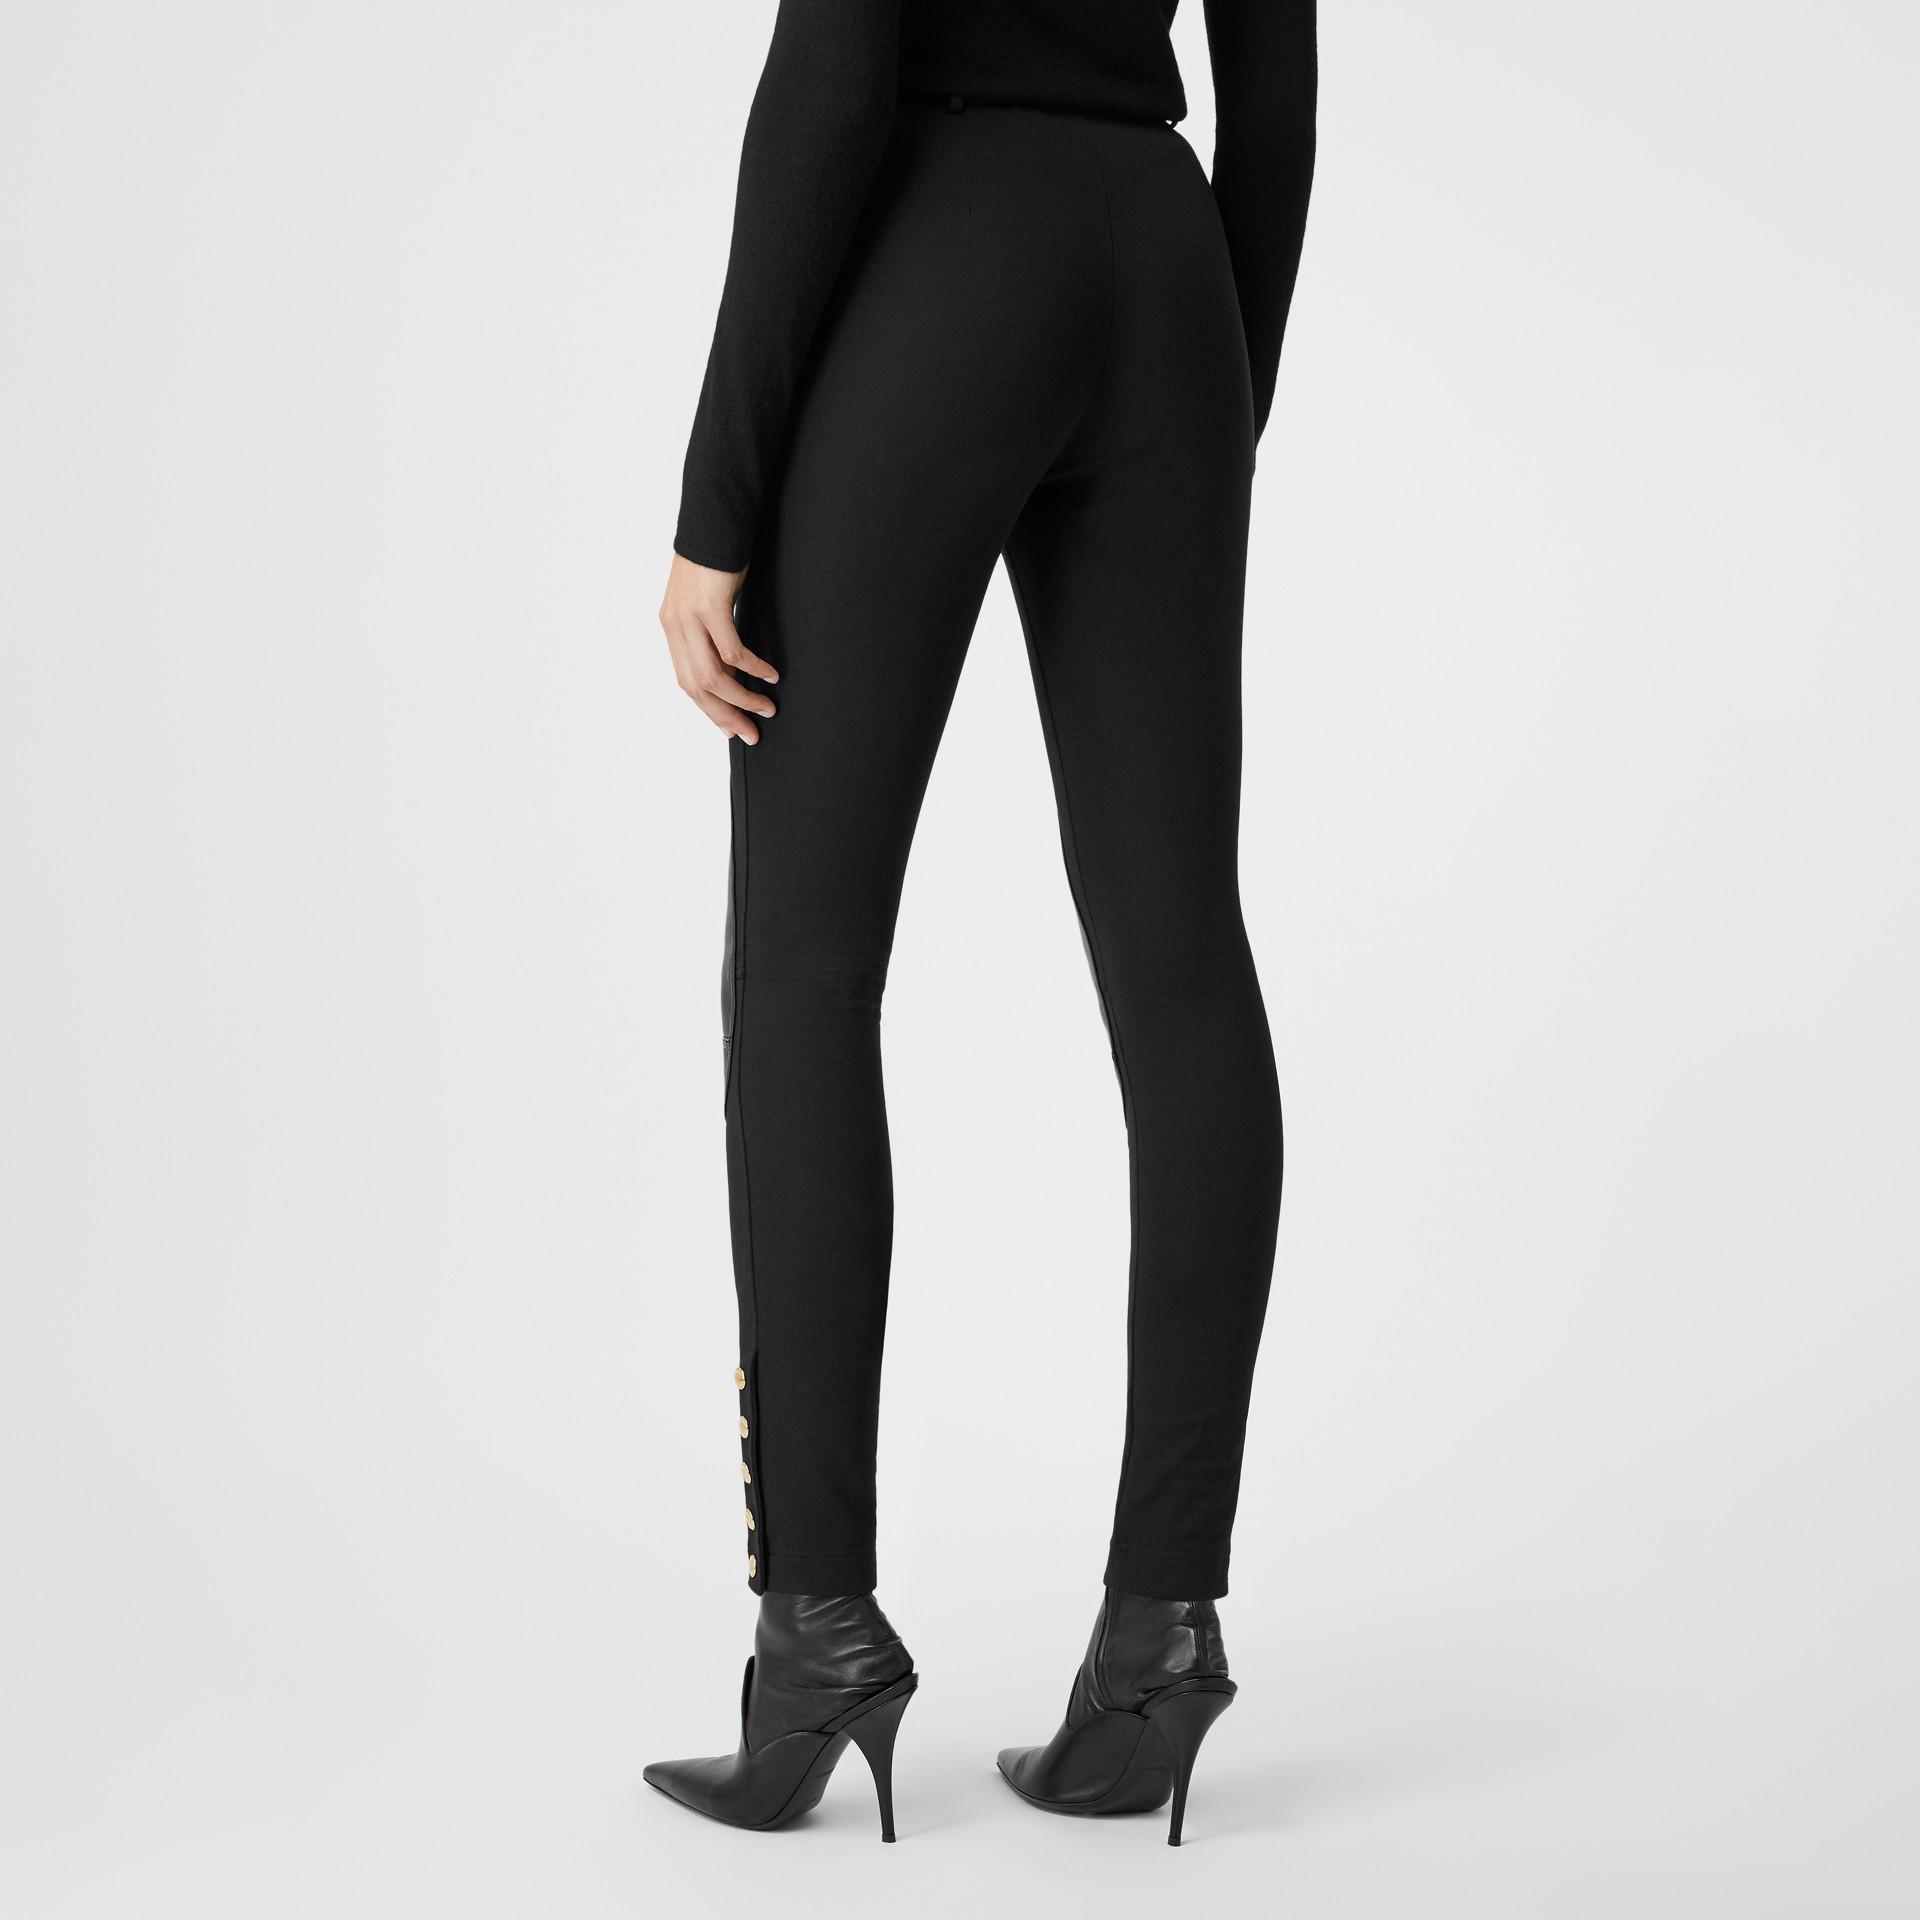 Lambskin Trim Stretch Cotton Blend Trousers in Black - Women | Burberry United Kingdom - gallery image 2